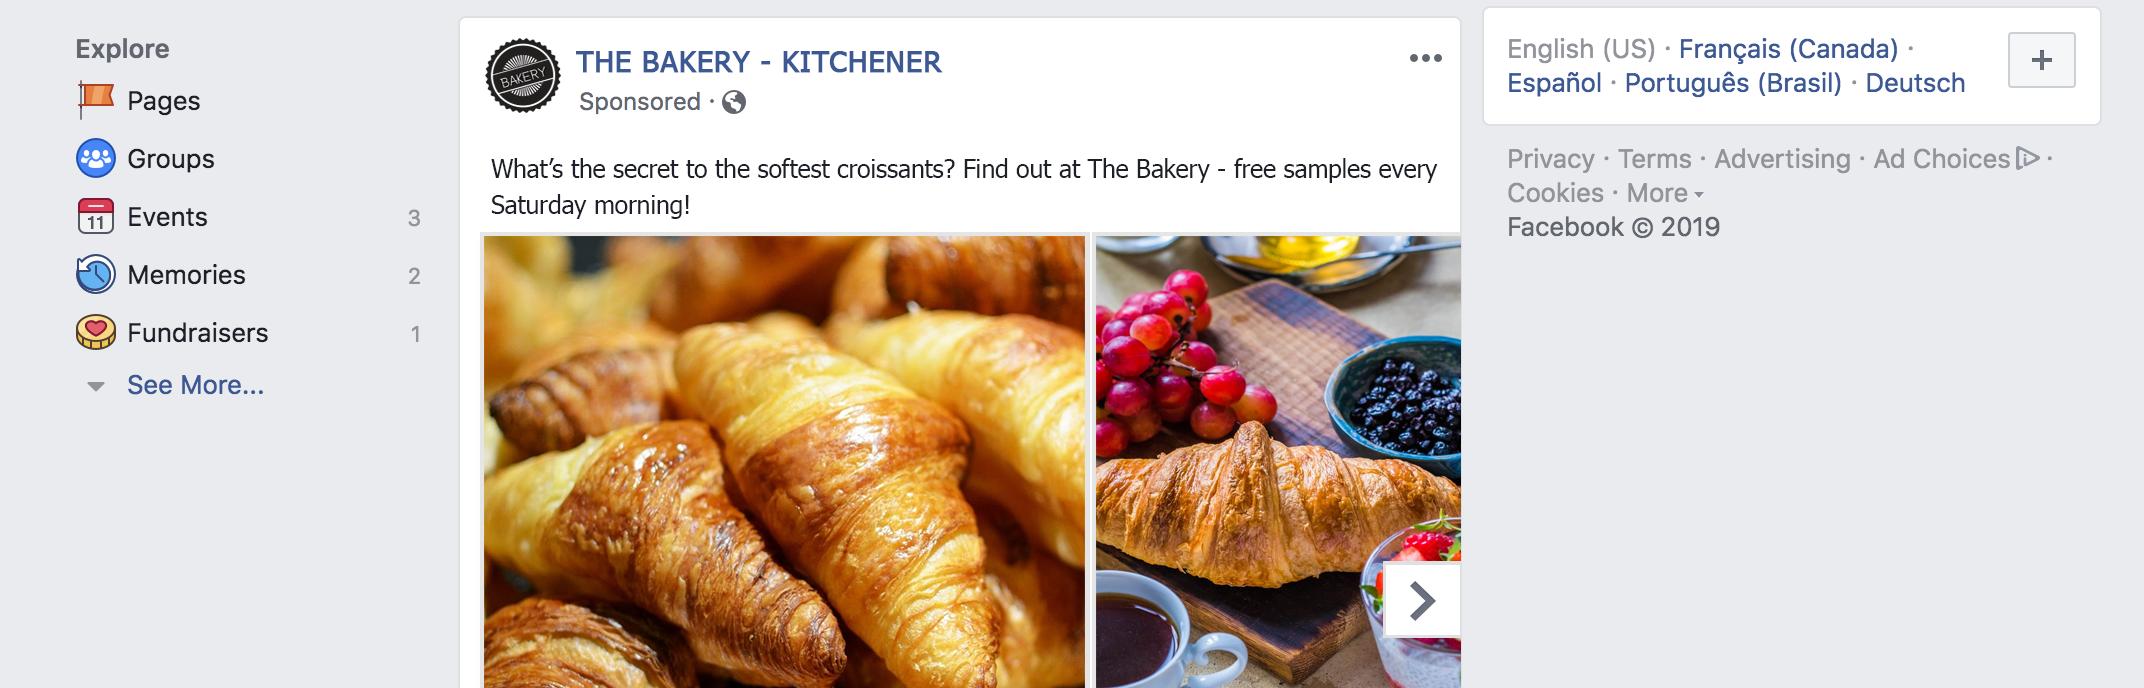 Facebook marketing partners help you create beautiful ads immediately!